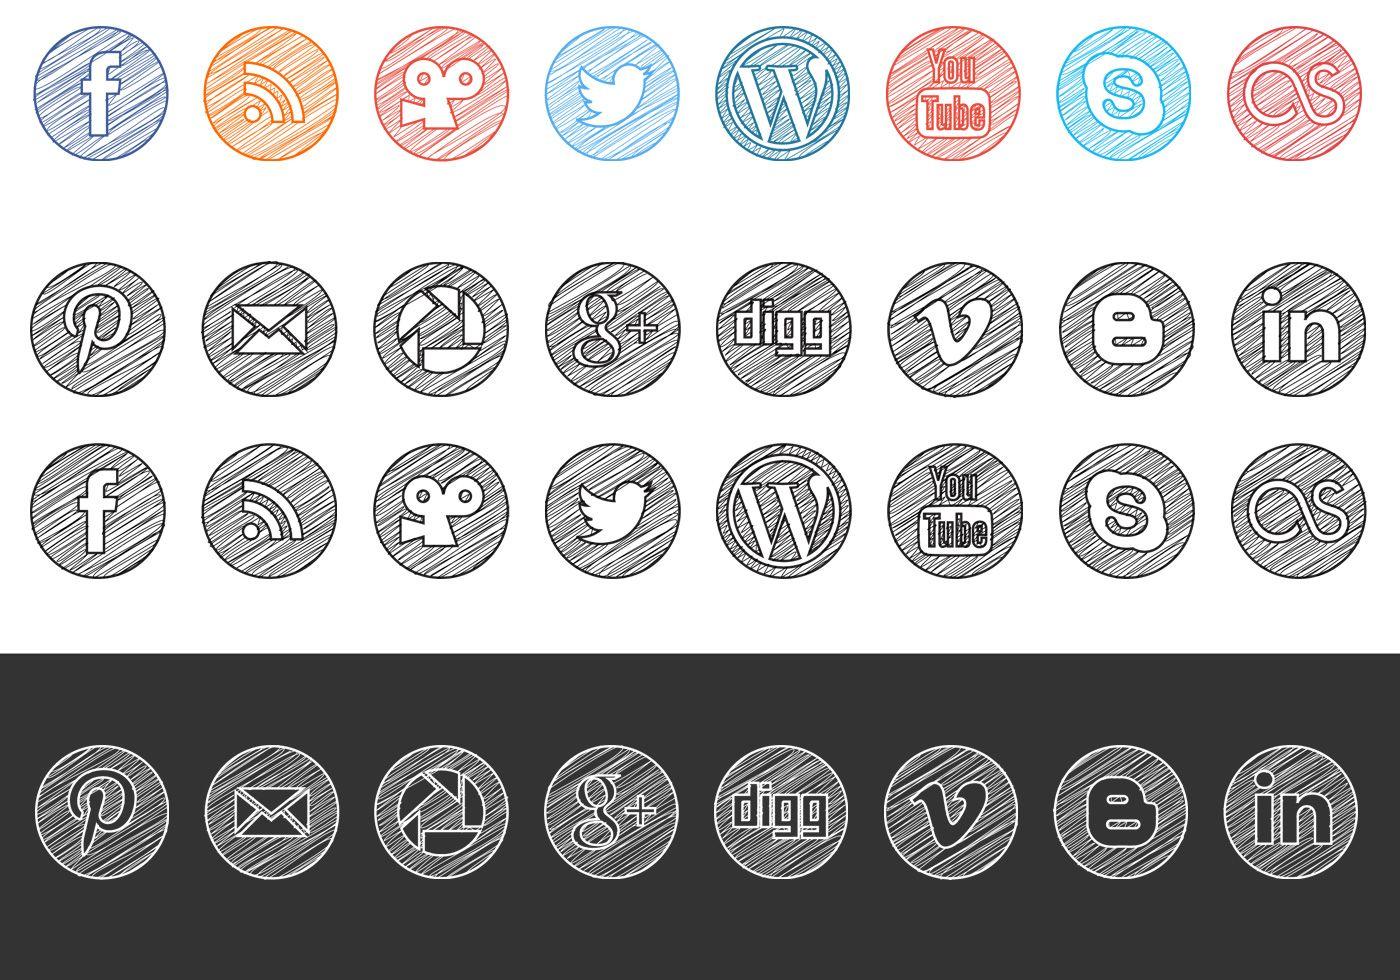 Social media icons vector clipart clip art transparent stock Sketchy Drawn Social Media Icons Vector Pack | Sick ... clip art transparent stock